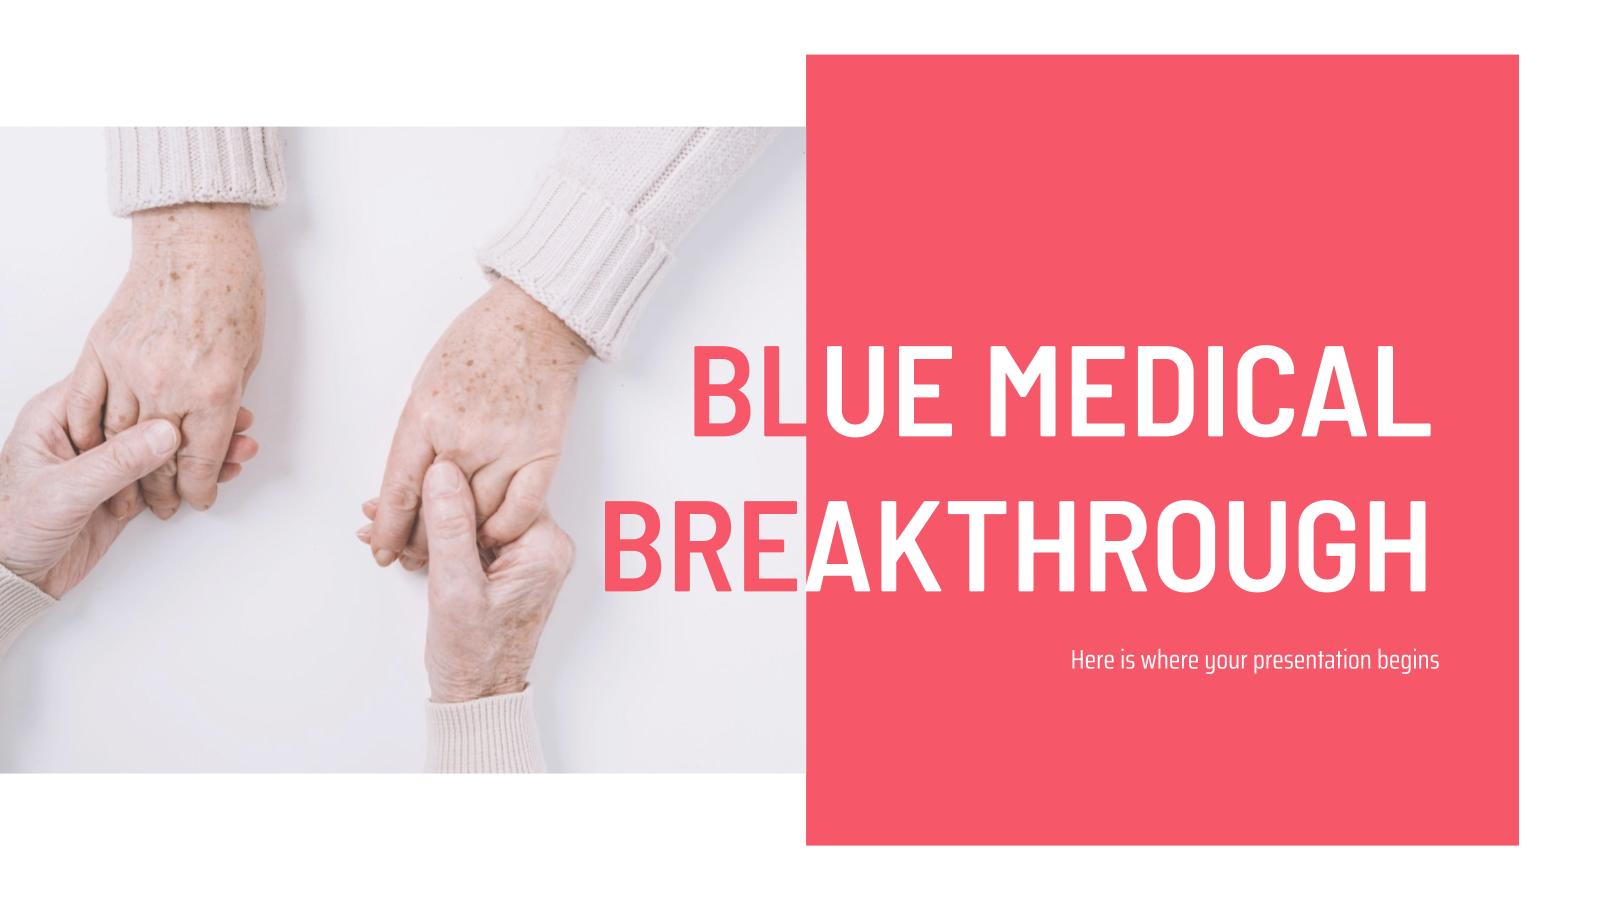 Plantilla de presentación Avances médicos azul